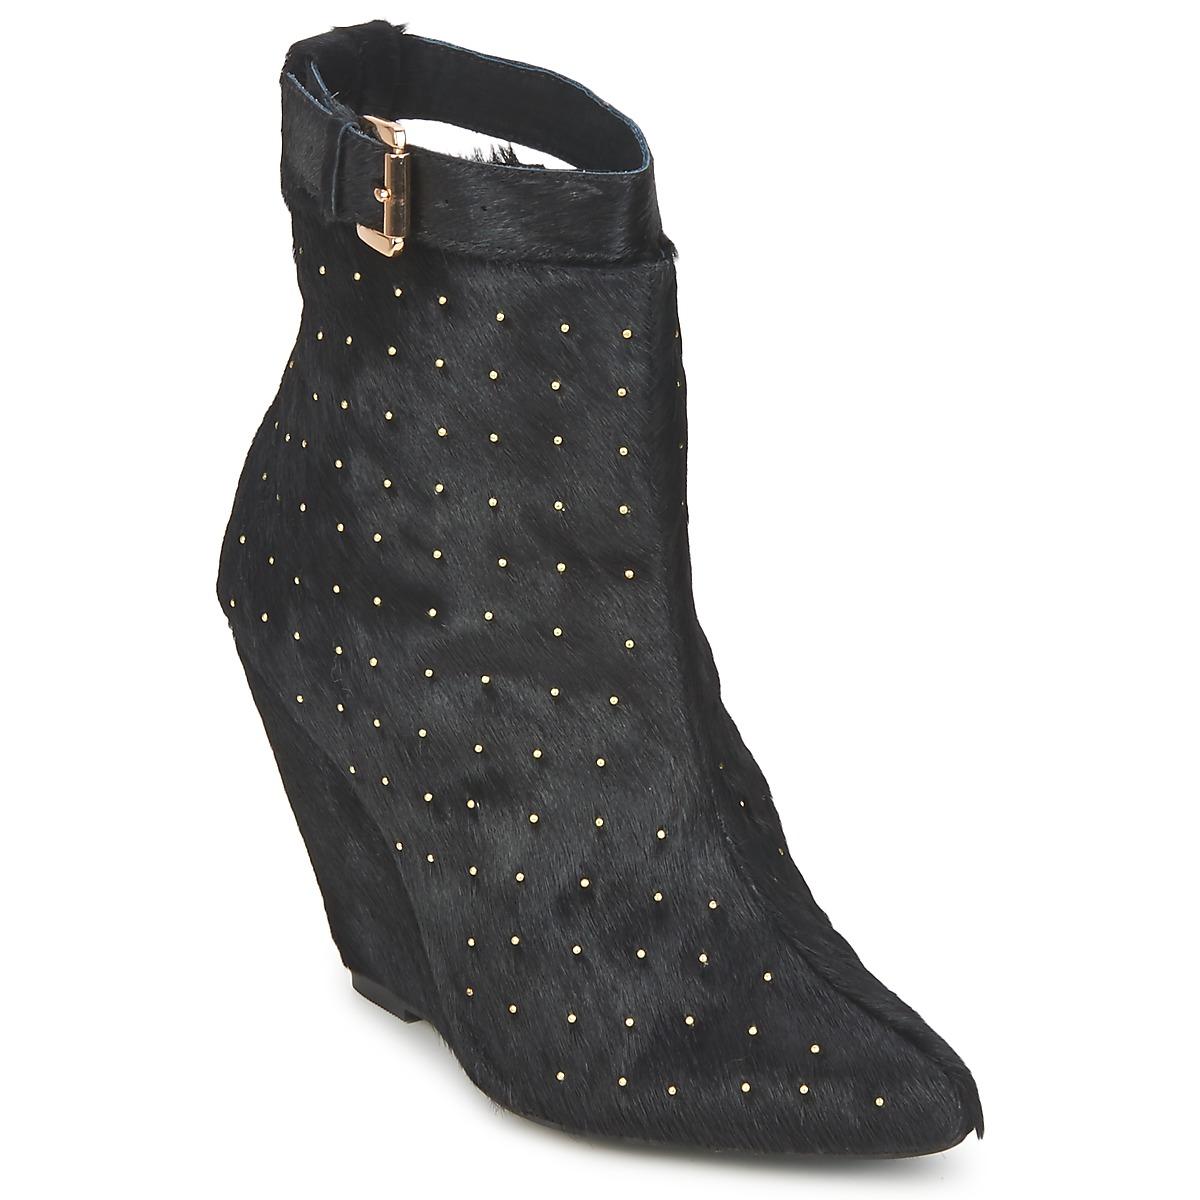 Friis & Company KANPUR Schwarz - Kostenloser Versand bei Spartoode ! - Schuhe Low Boots Damen 78,50 €